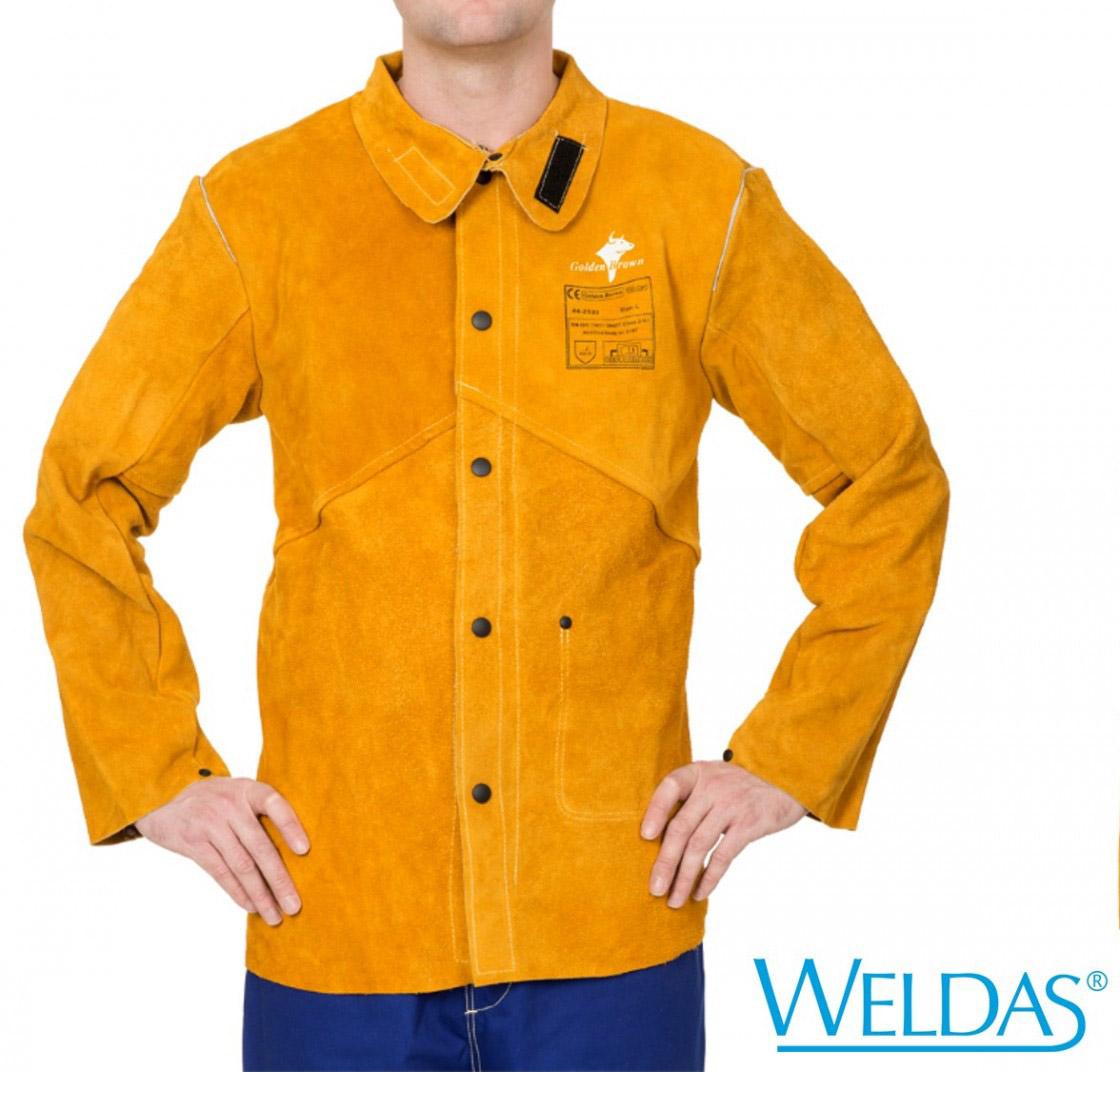 WELDAS Casaco Golden Brown Costas de Algodão 44-2530/P